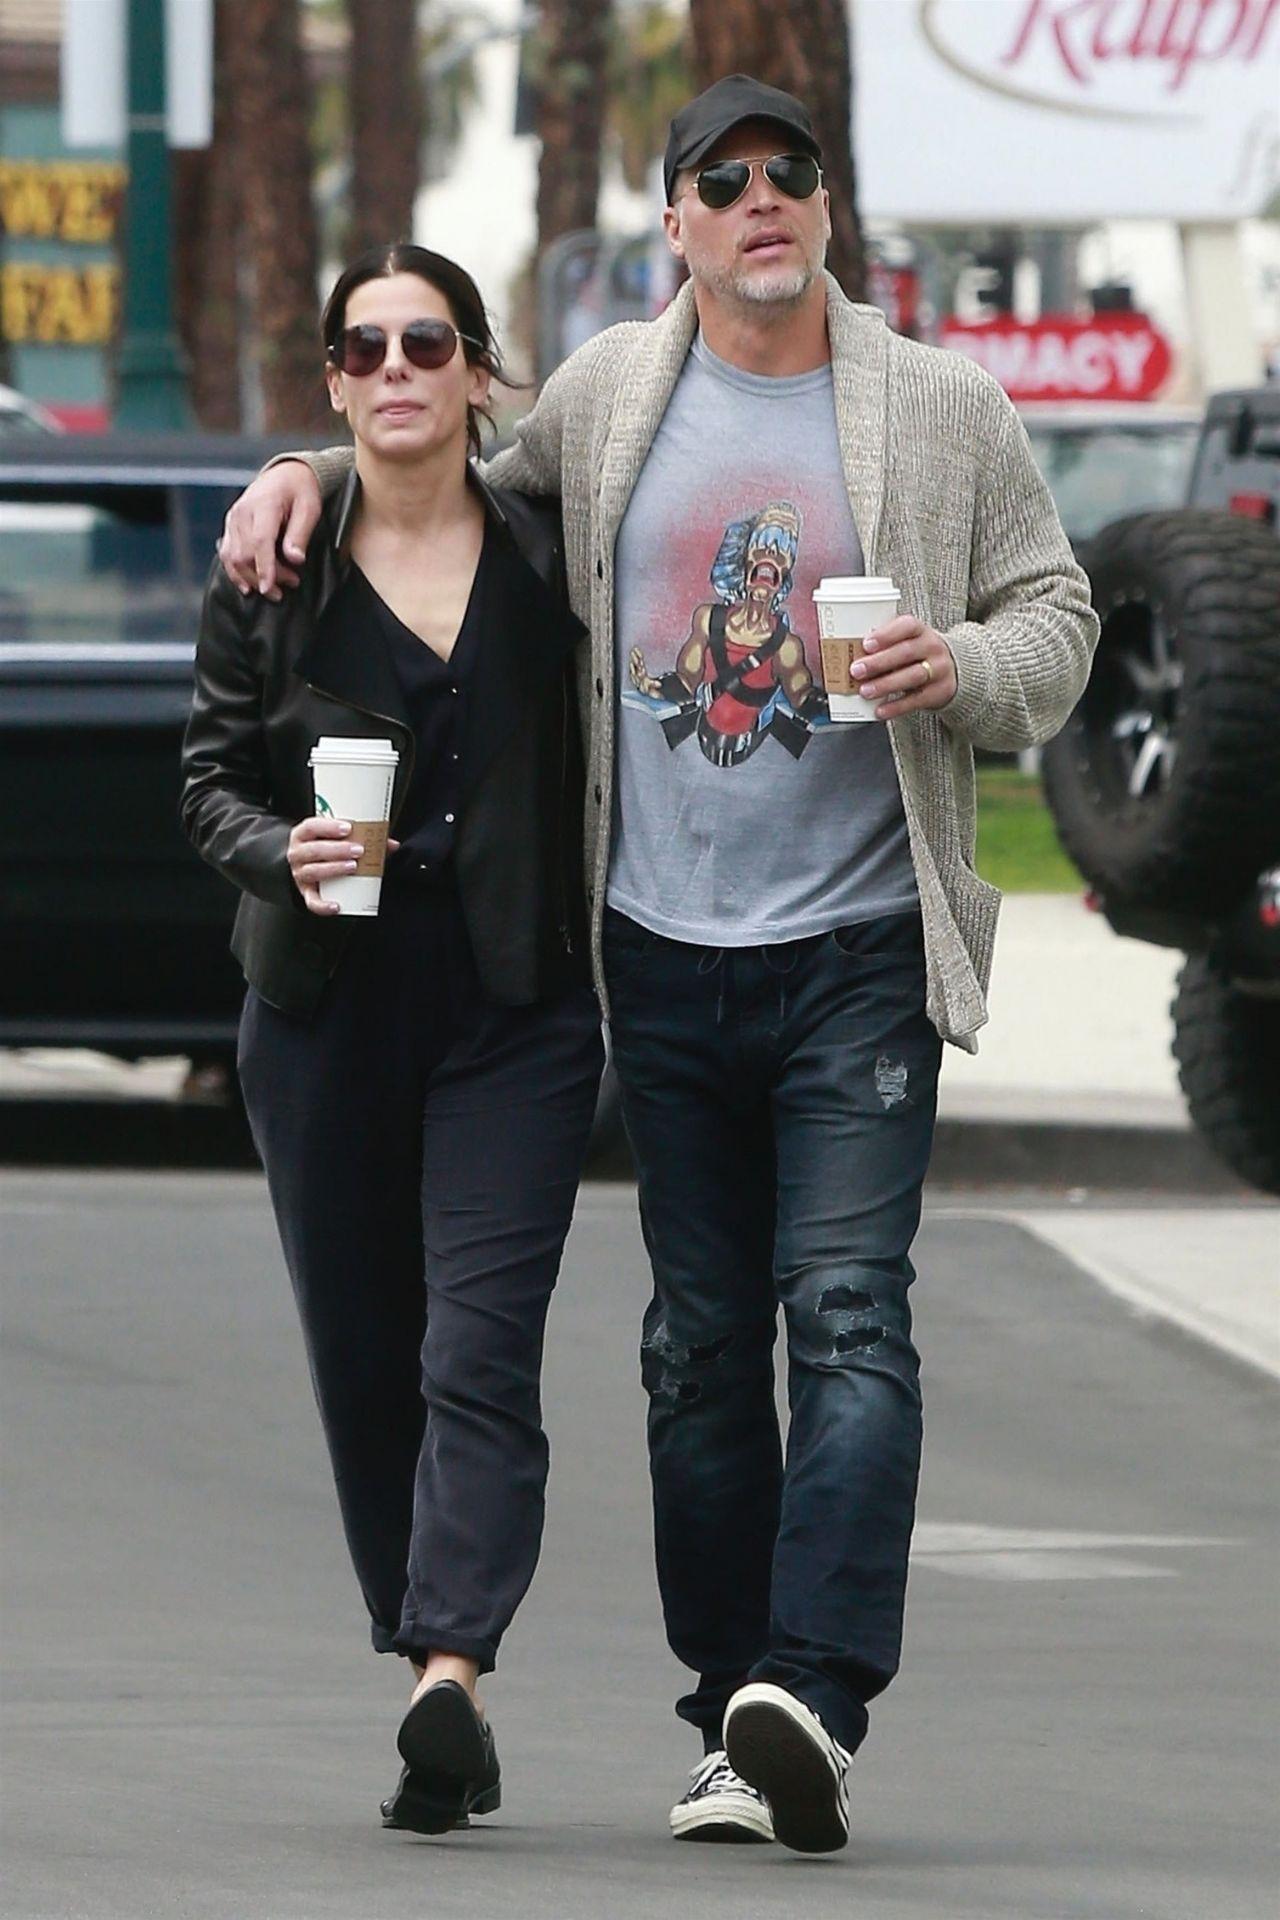 Sandra Bullock And Bryan Randall Out In Studio City 03